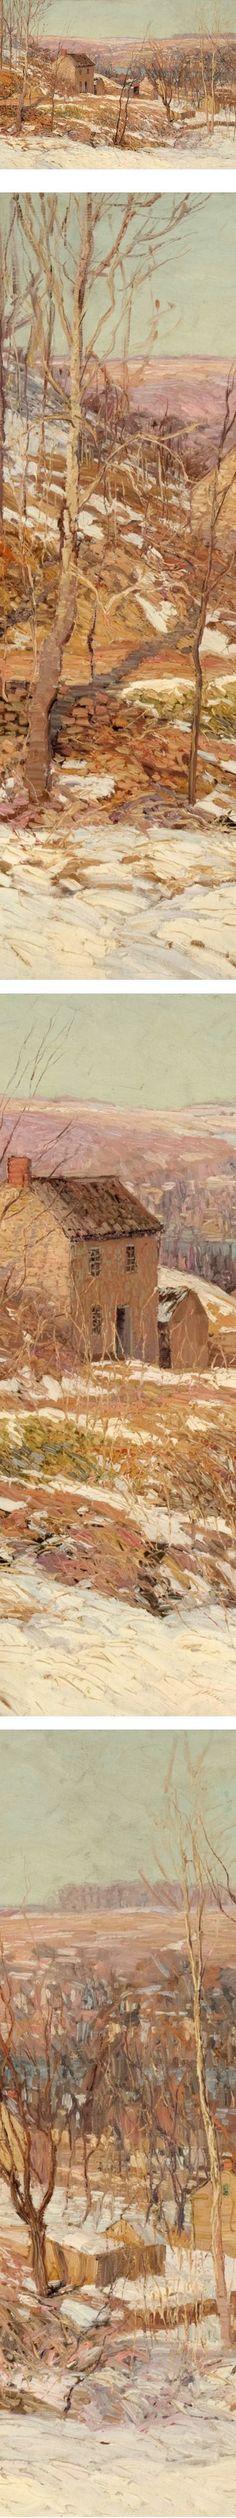 Winter in the Valley, Edward Willis Redfield